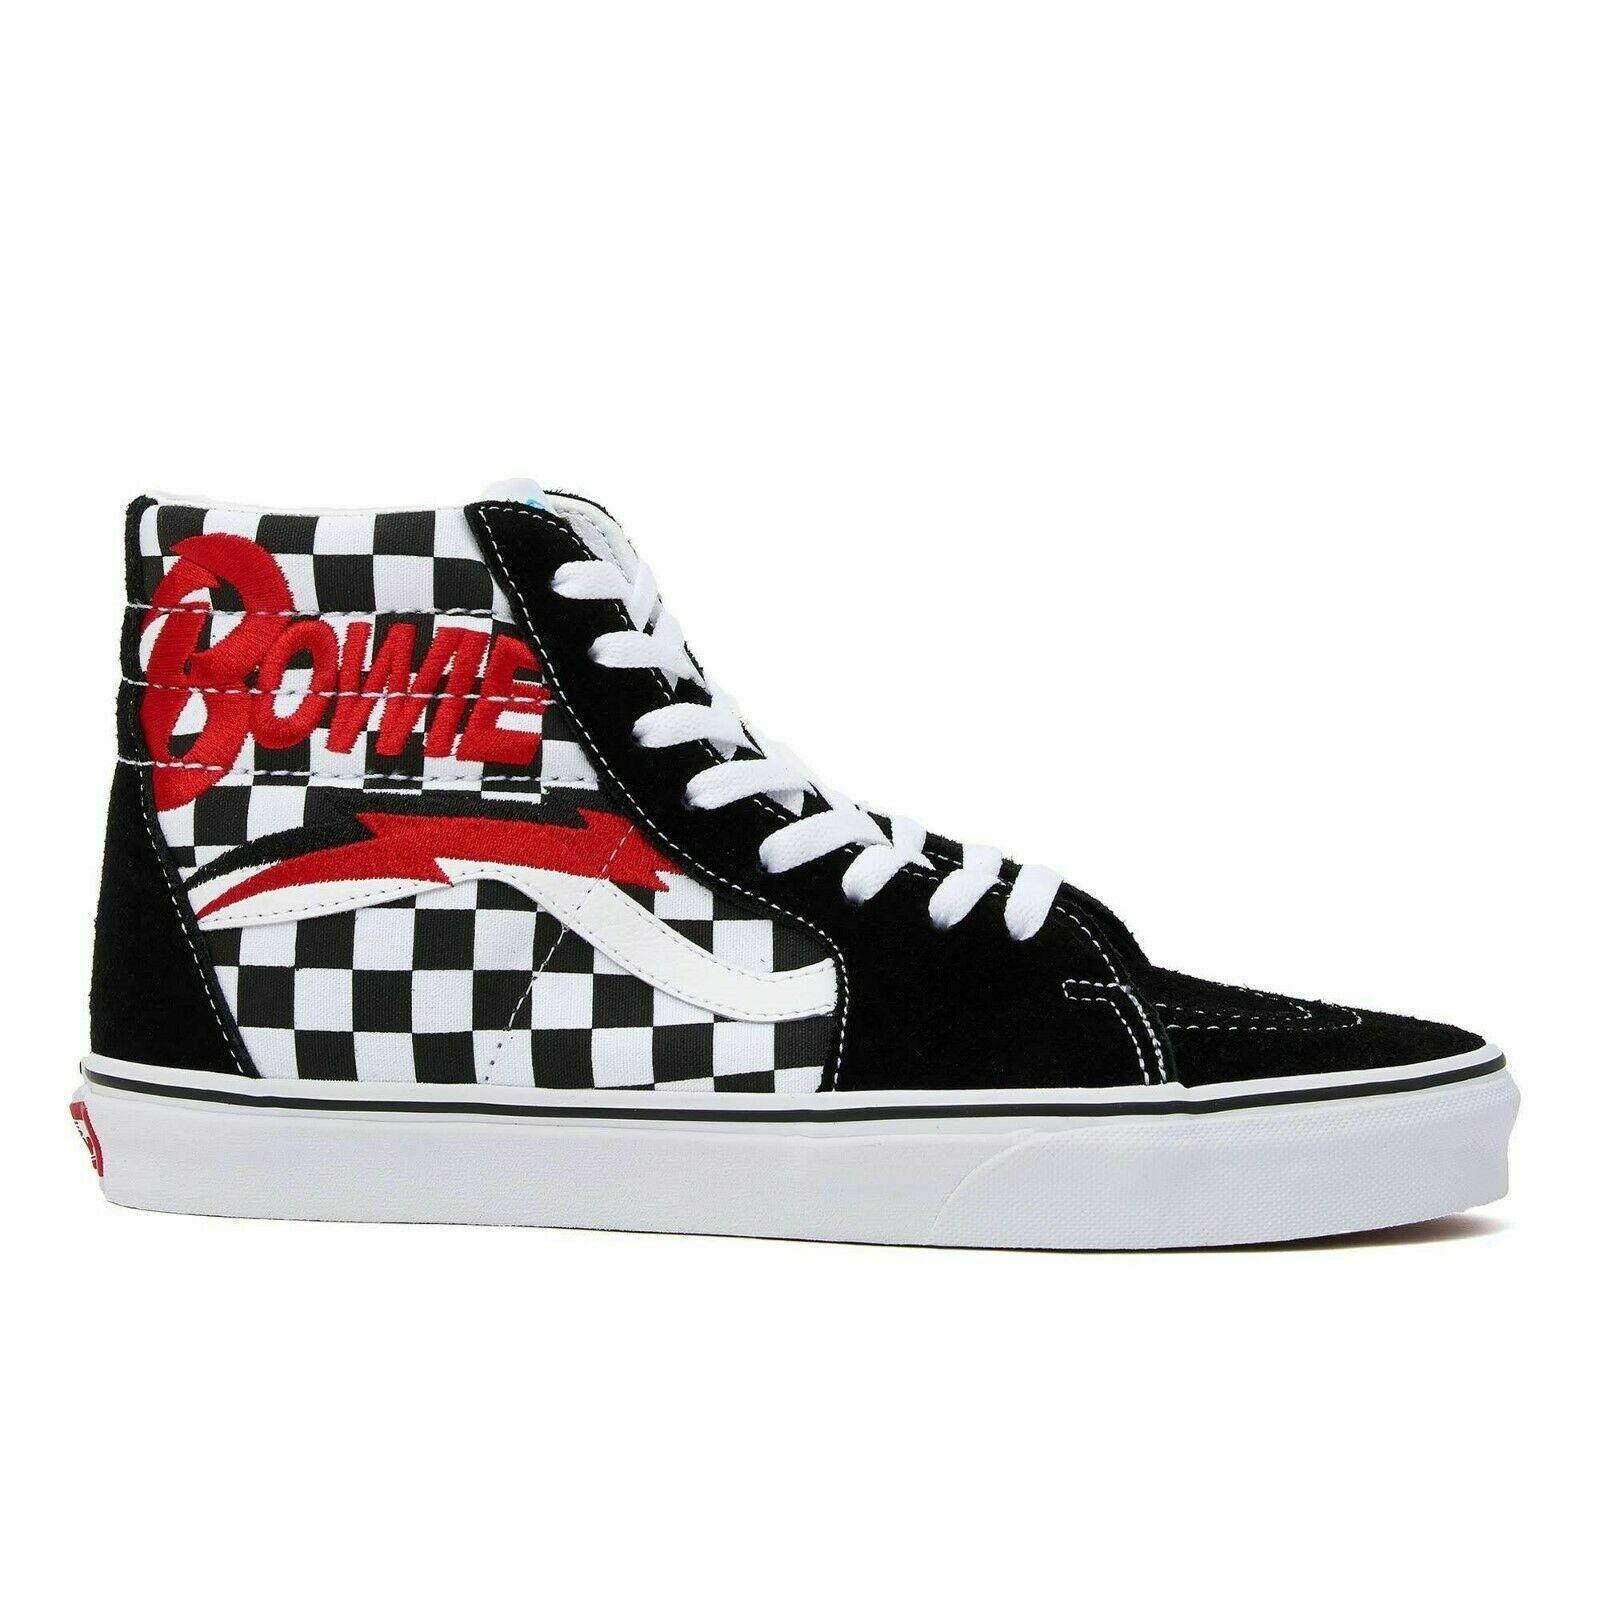 New VANS X DAVID BOWIE SK8-Hi Checkerboard Sneaker Limited edition CHECKERBOARD - $139.99